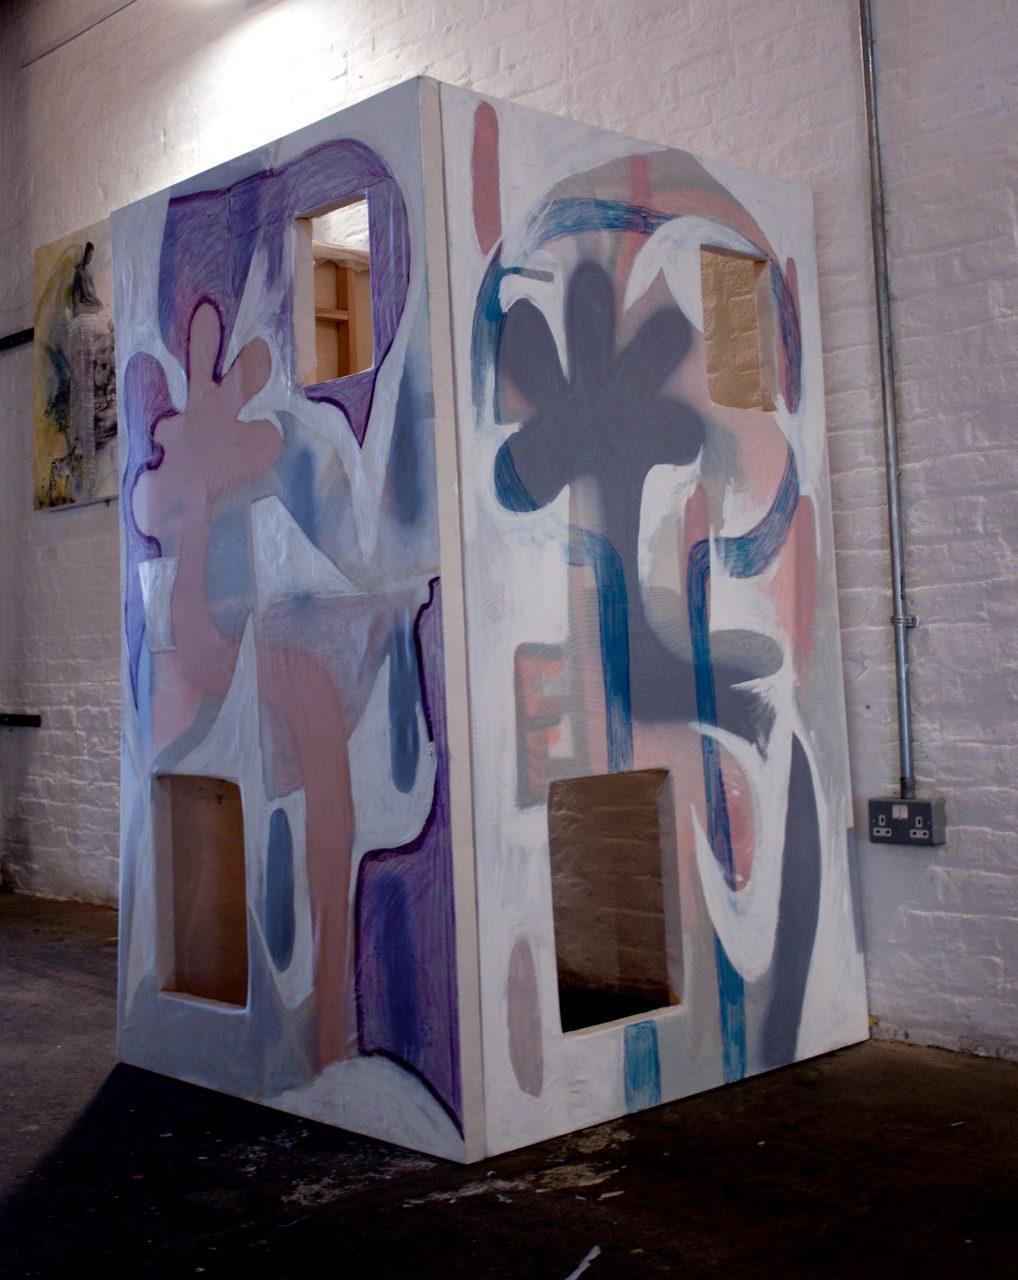 Peekaboo, Mixed Media on Canvas, @ Brixton East Gallery